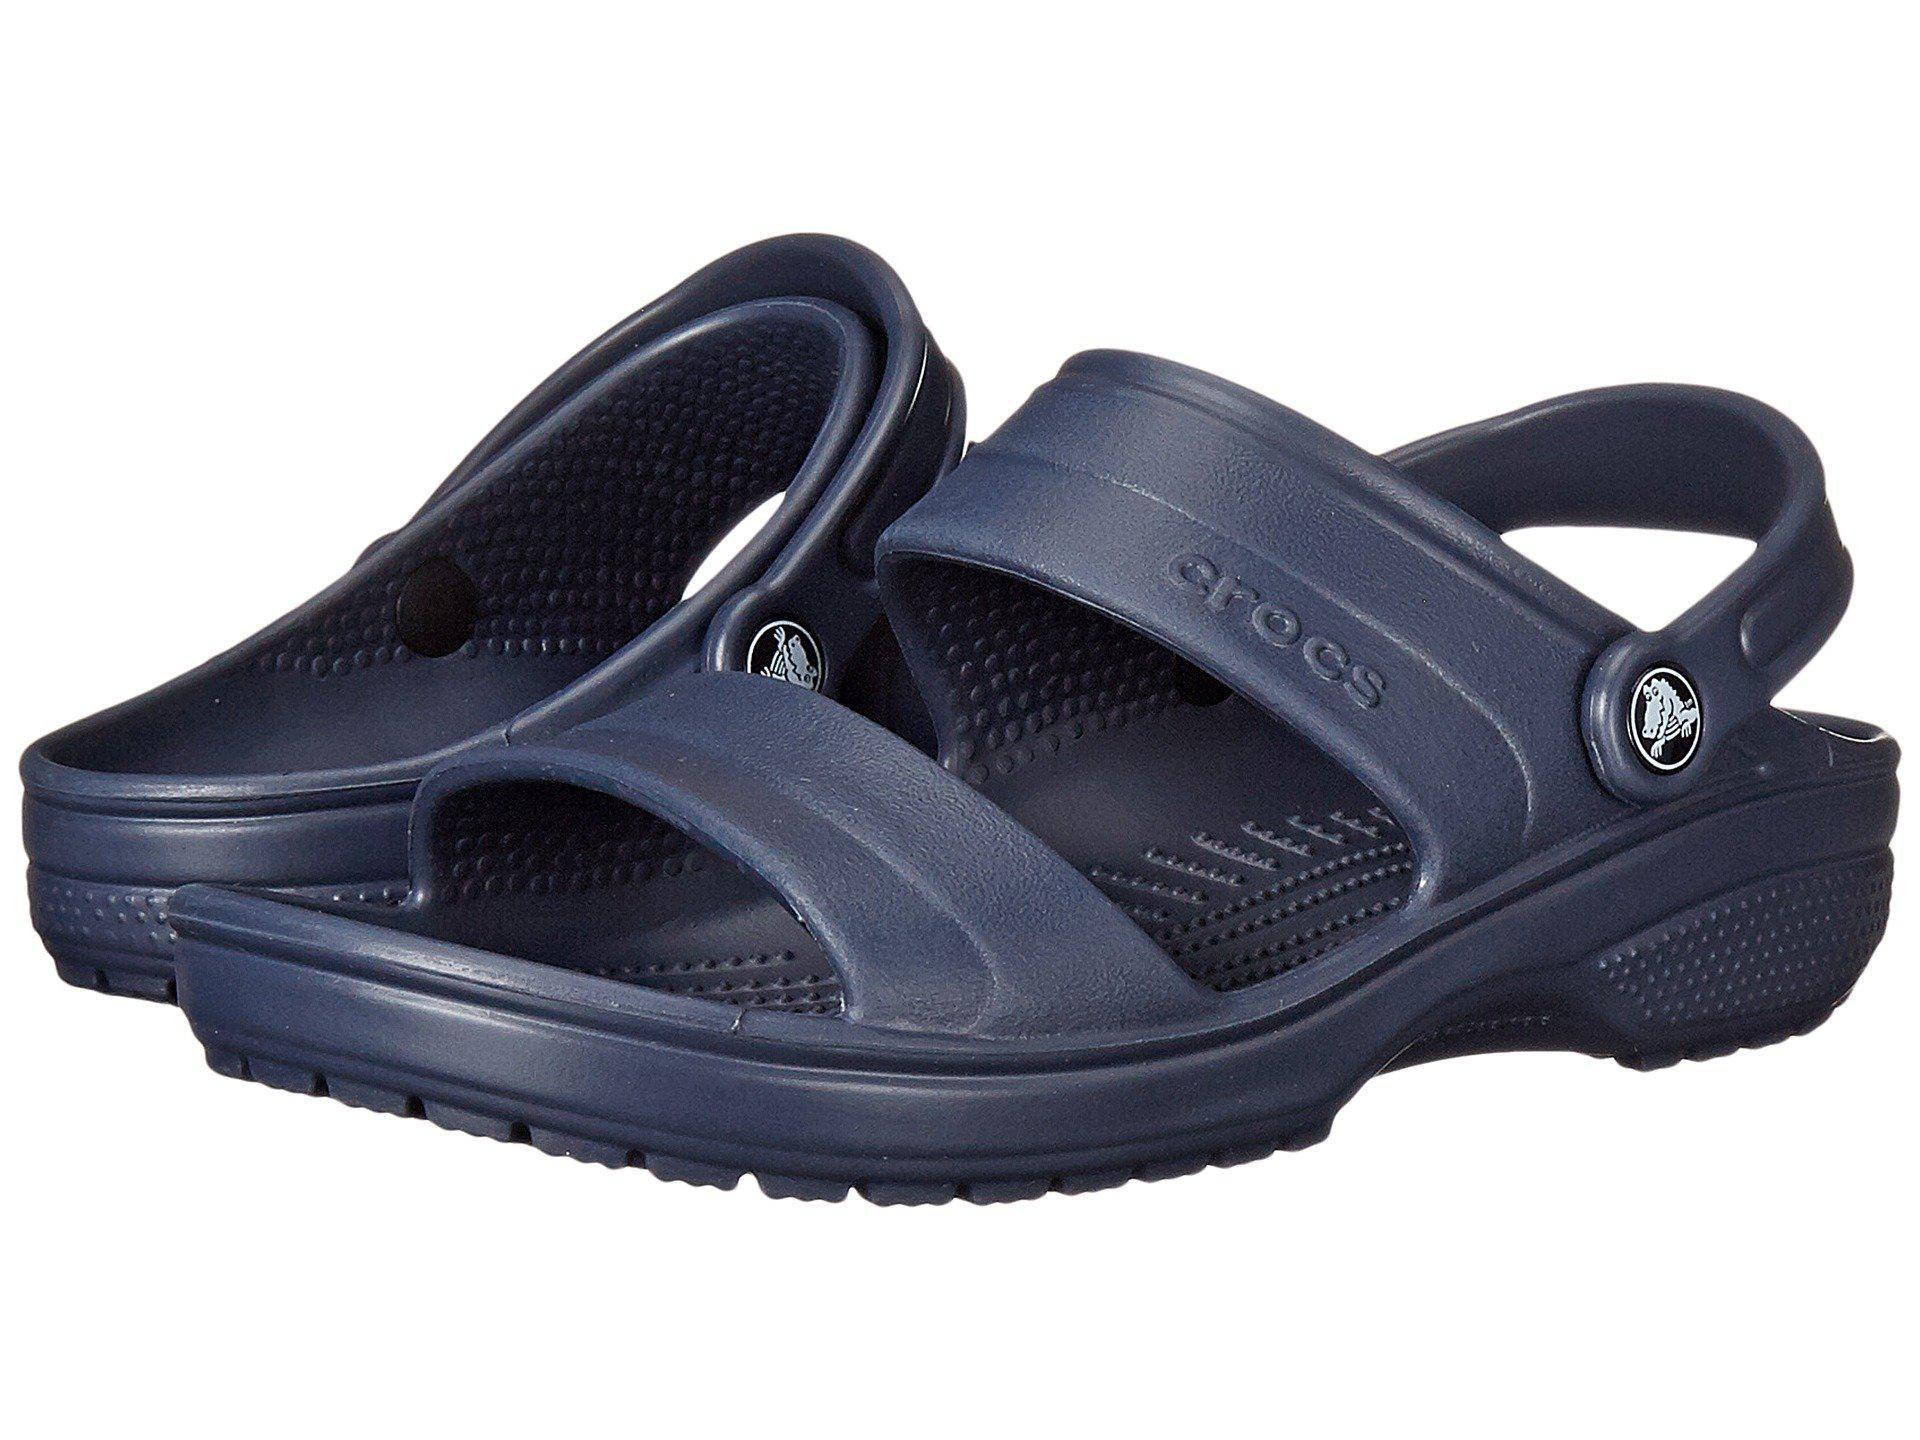 0b3022599 Lyst - Crocs™ Classic Sandal in Blue